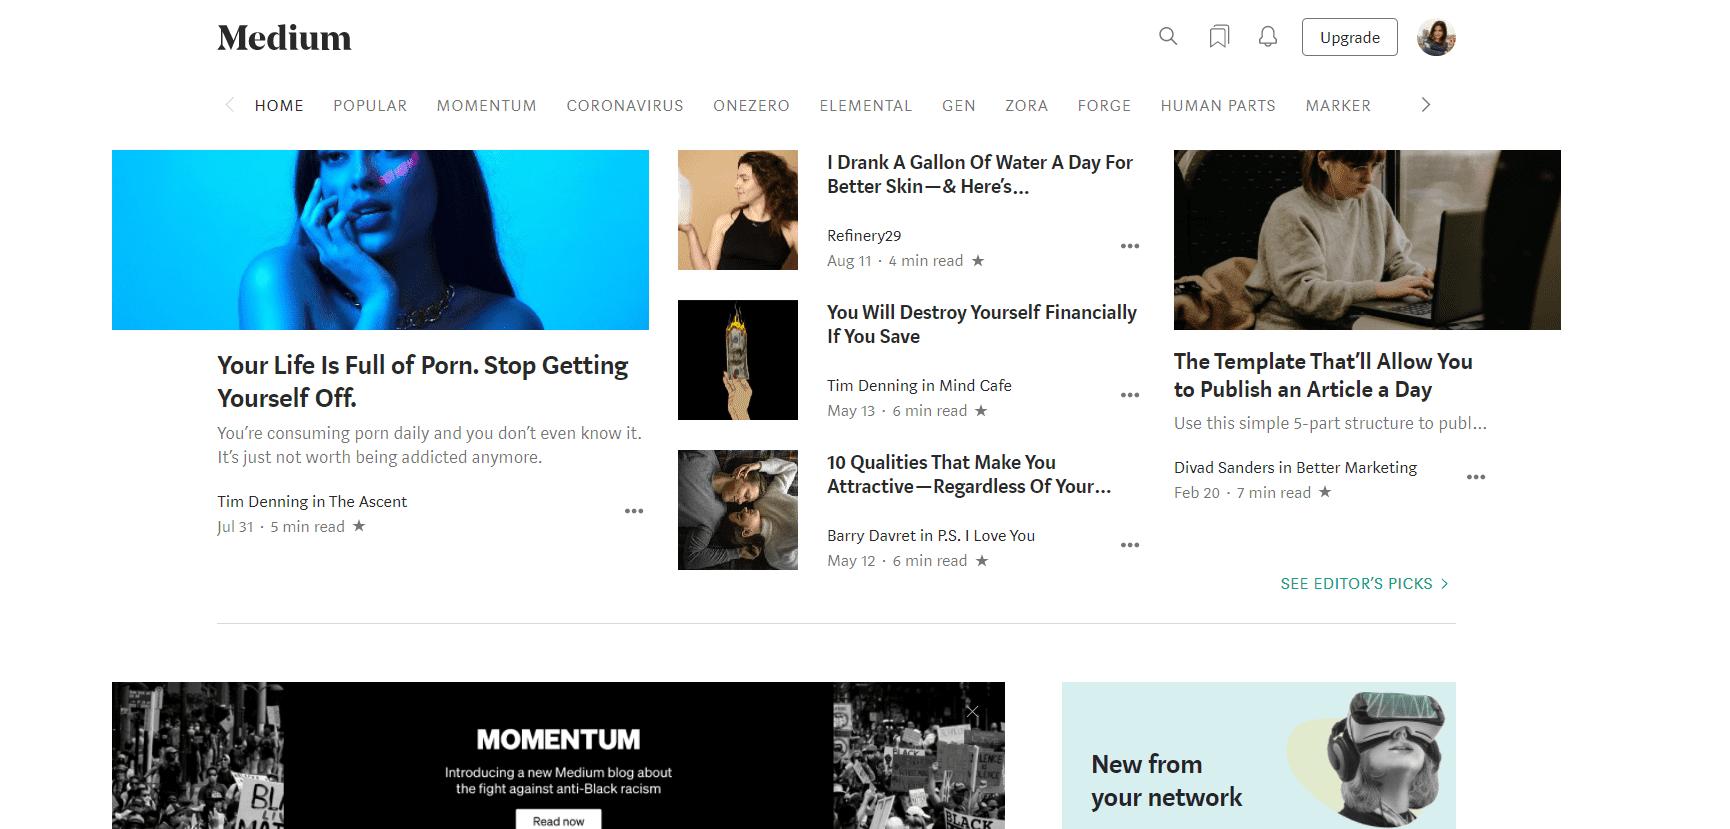 Medium webpage